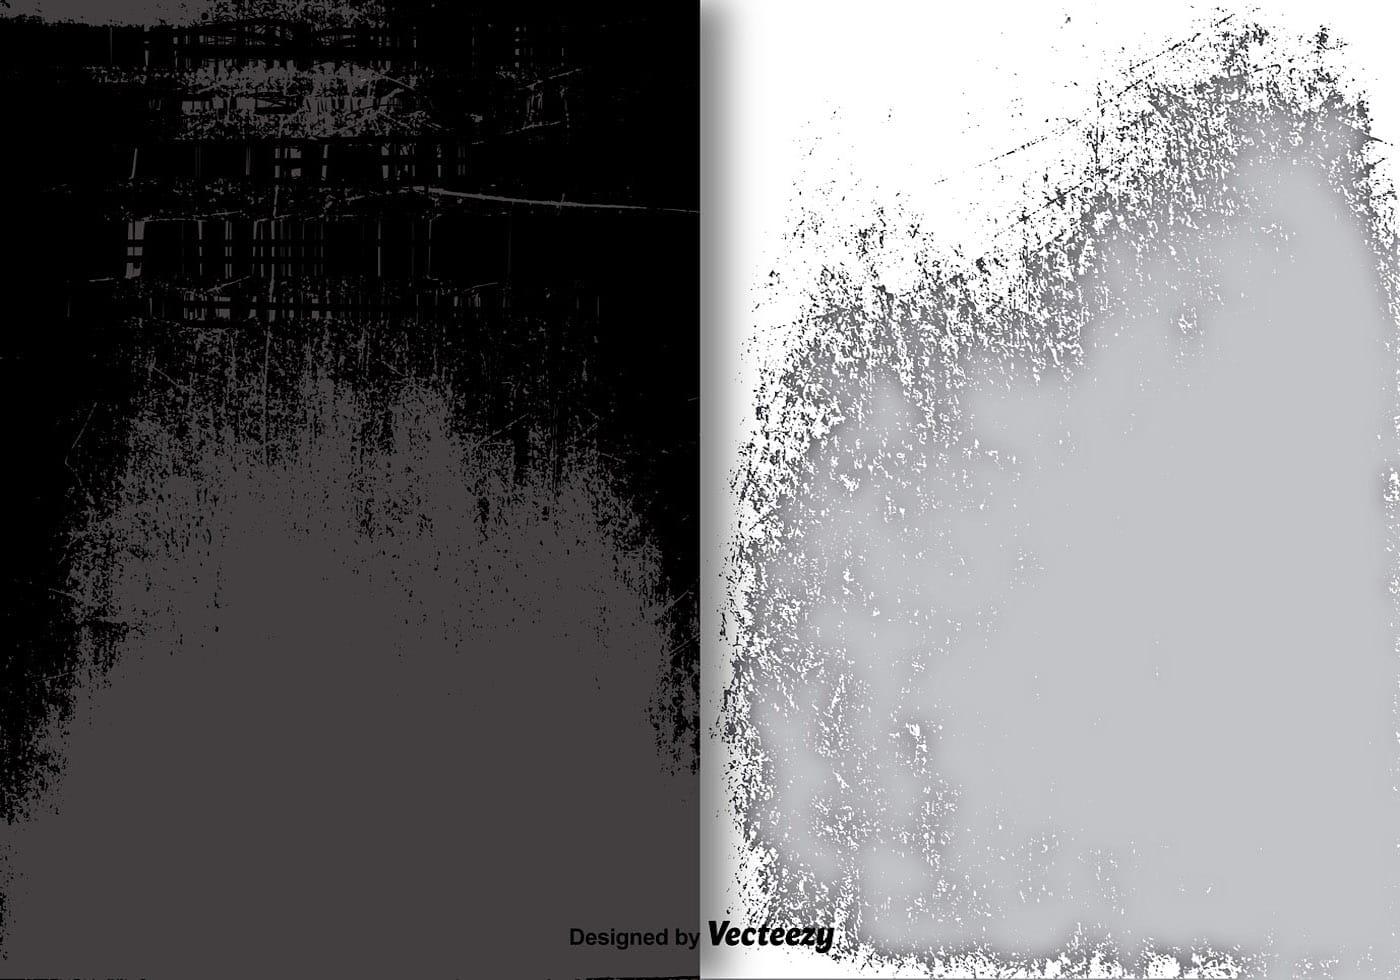 Grunge Overlay Vectors Download Free Vector Art Stock Graphics Amp Images